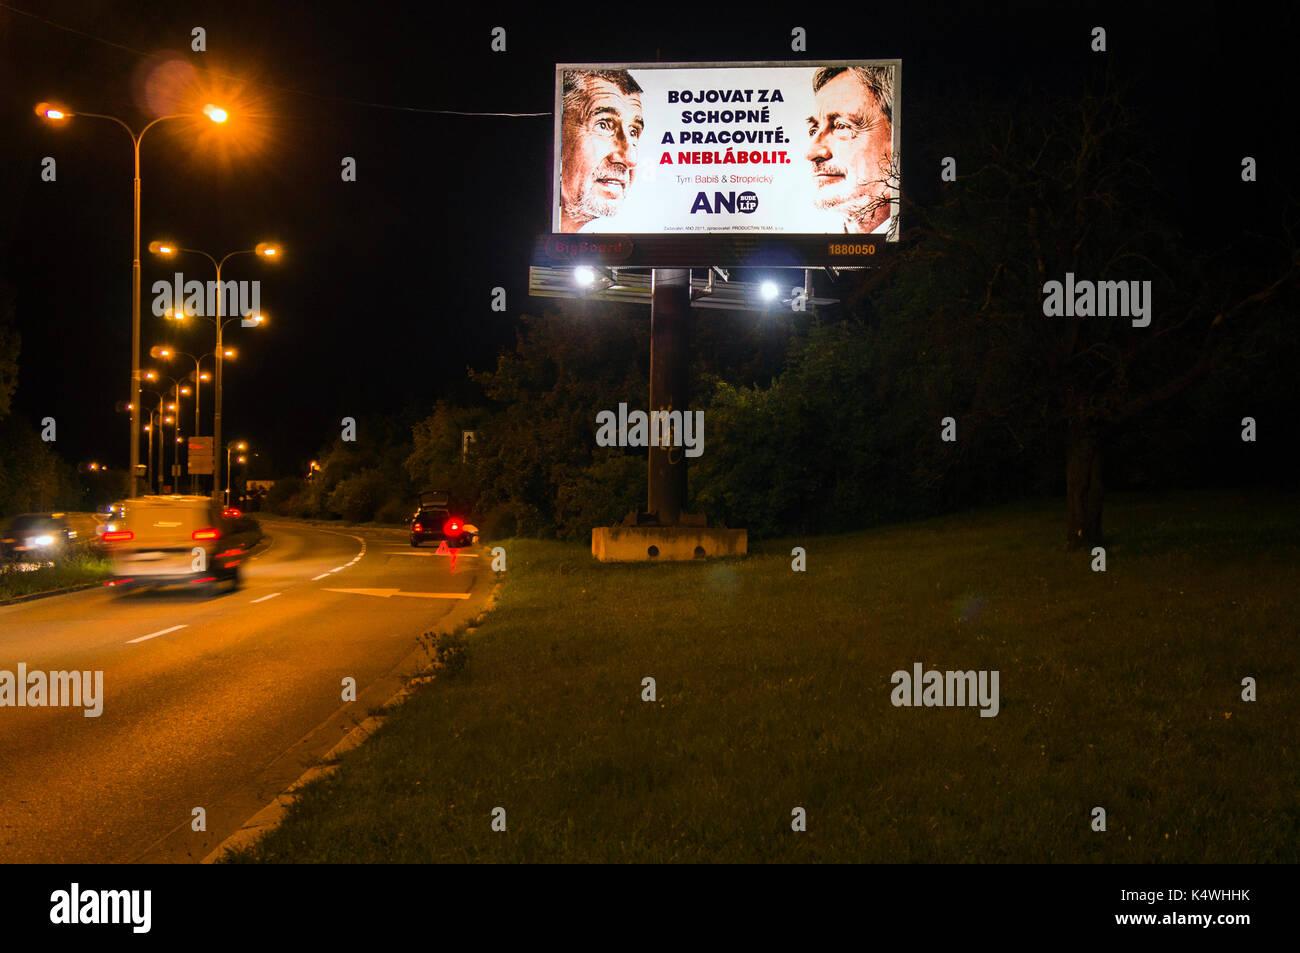 BigBoard, politicke hnuti ANO 2011, Andrej Babis, Martin Stropnicky, slogan BOJOVAT ZA SCHOPNE A PRACOVITE. A NEBLABOLIT, politicka propagace, politicky marketing, parlamentni volby, predvolebni kampan, volebni billboard, reklama politicke - Stock Image